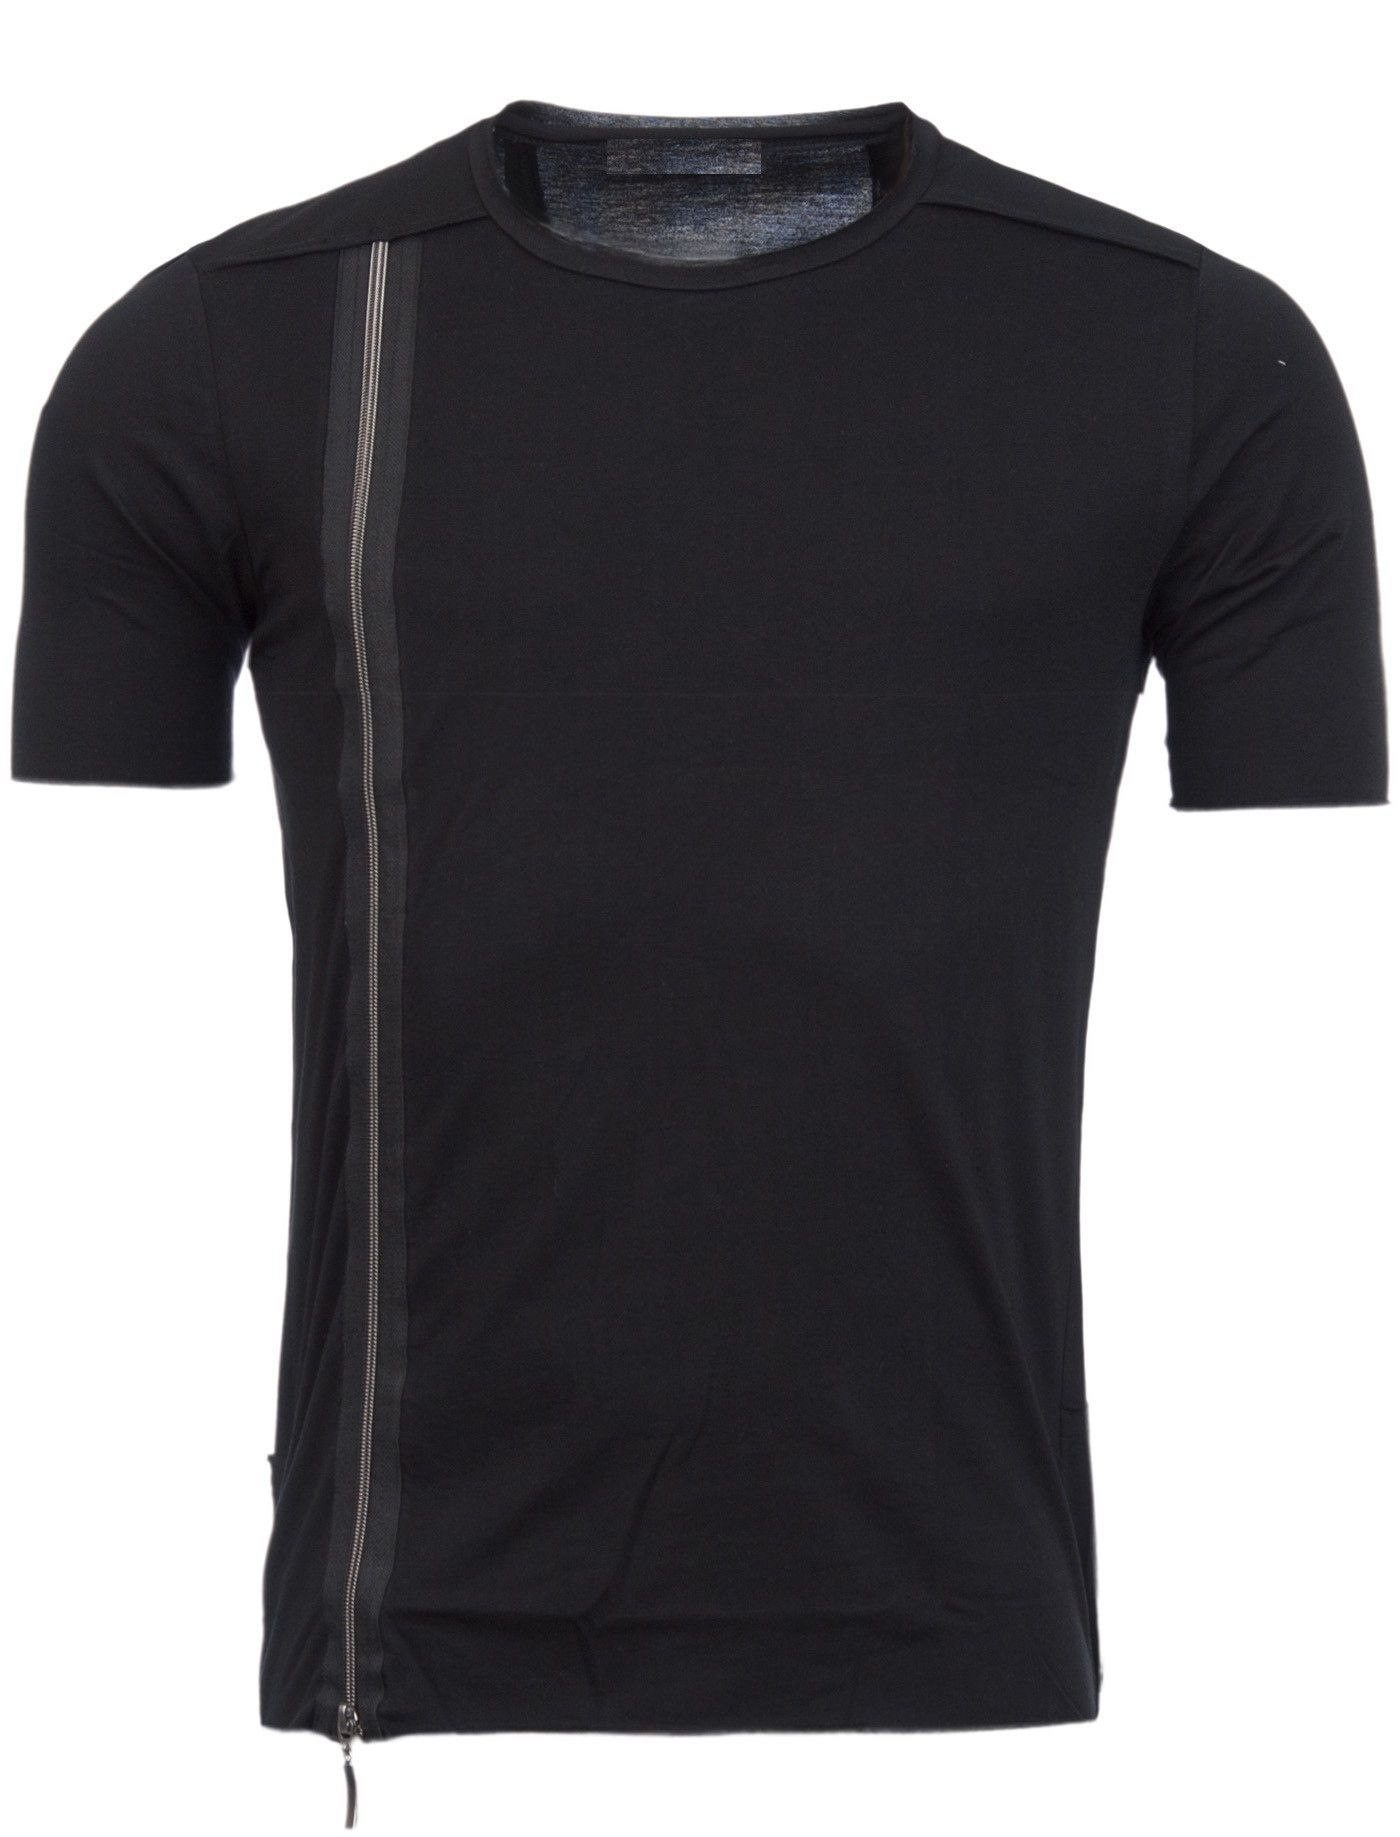 Black t shirt with zipper - Black T Shirt With Zipper 49